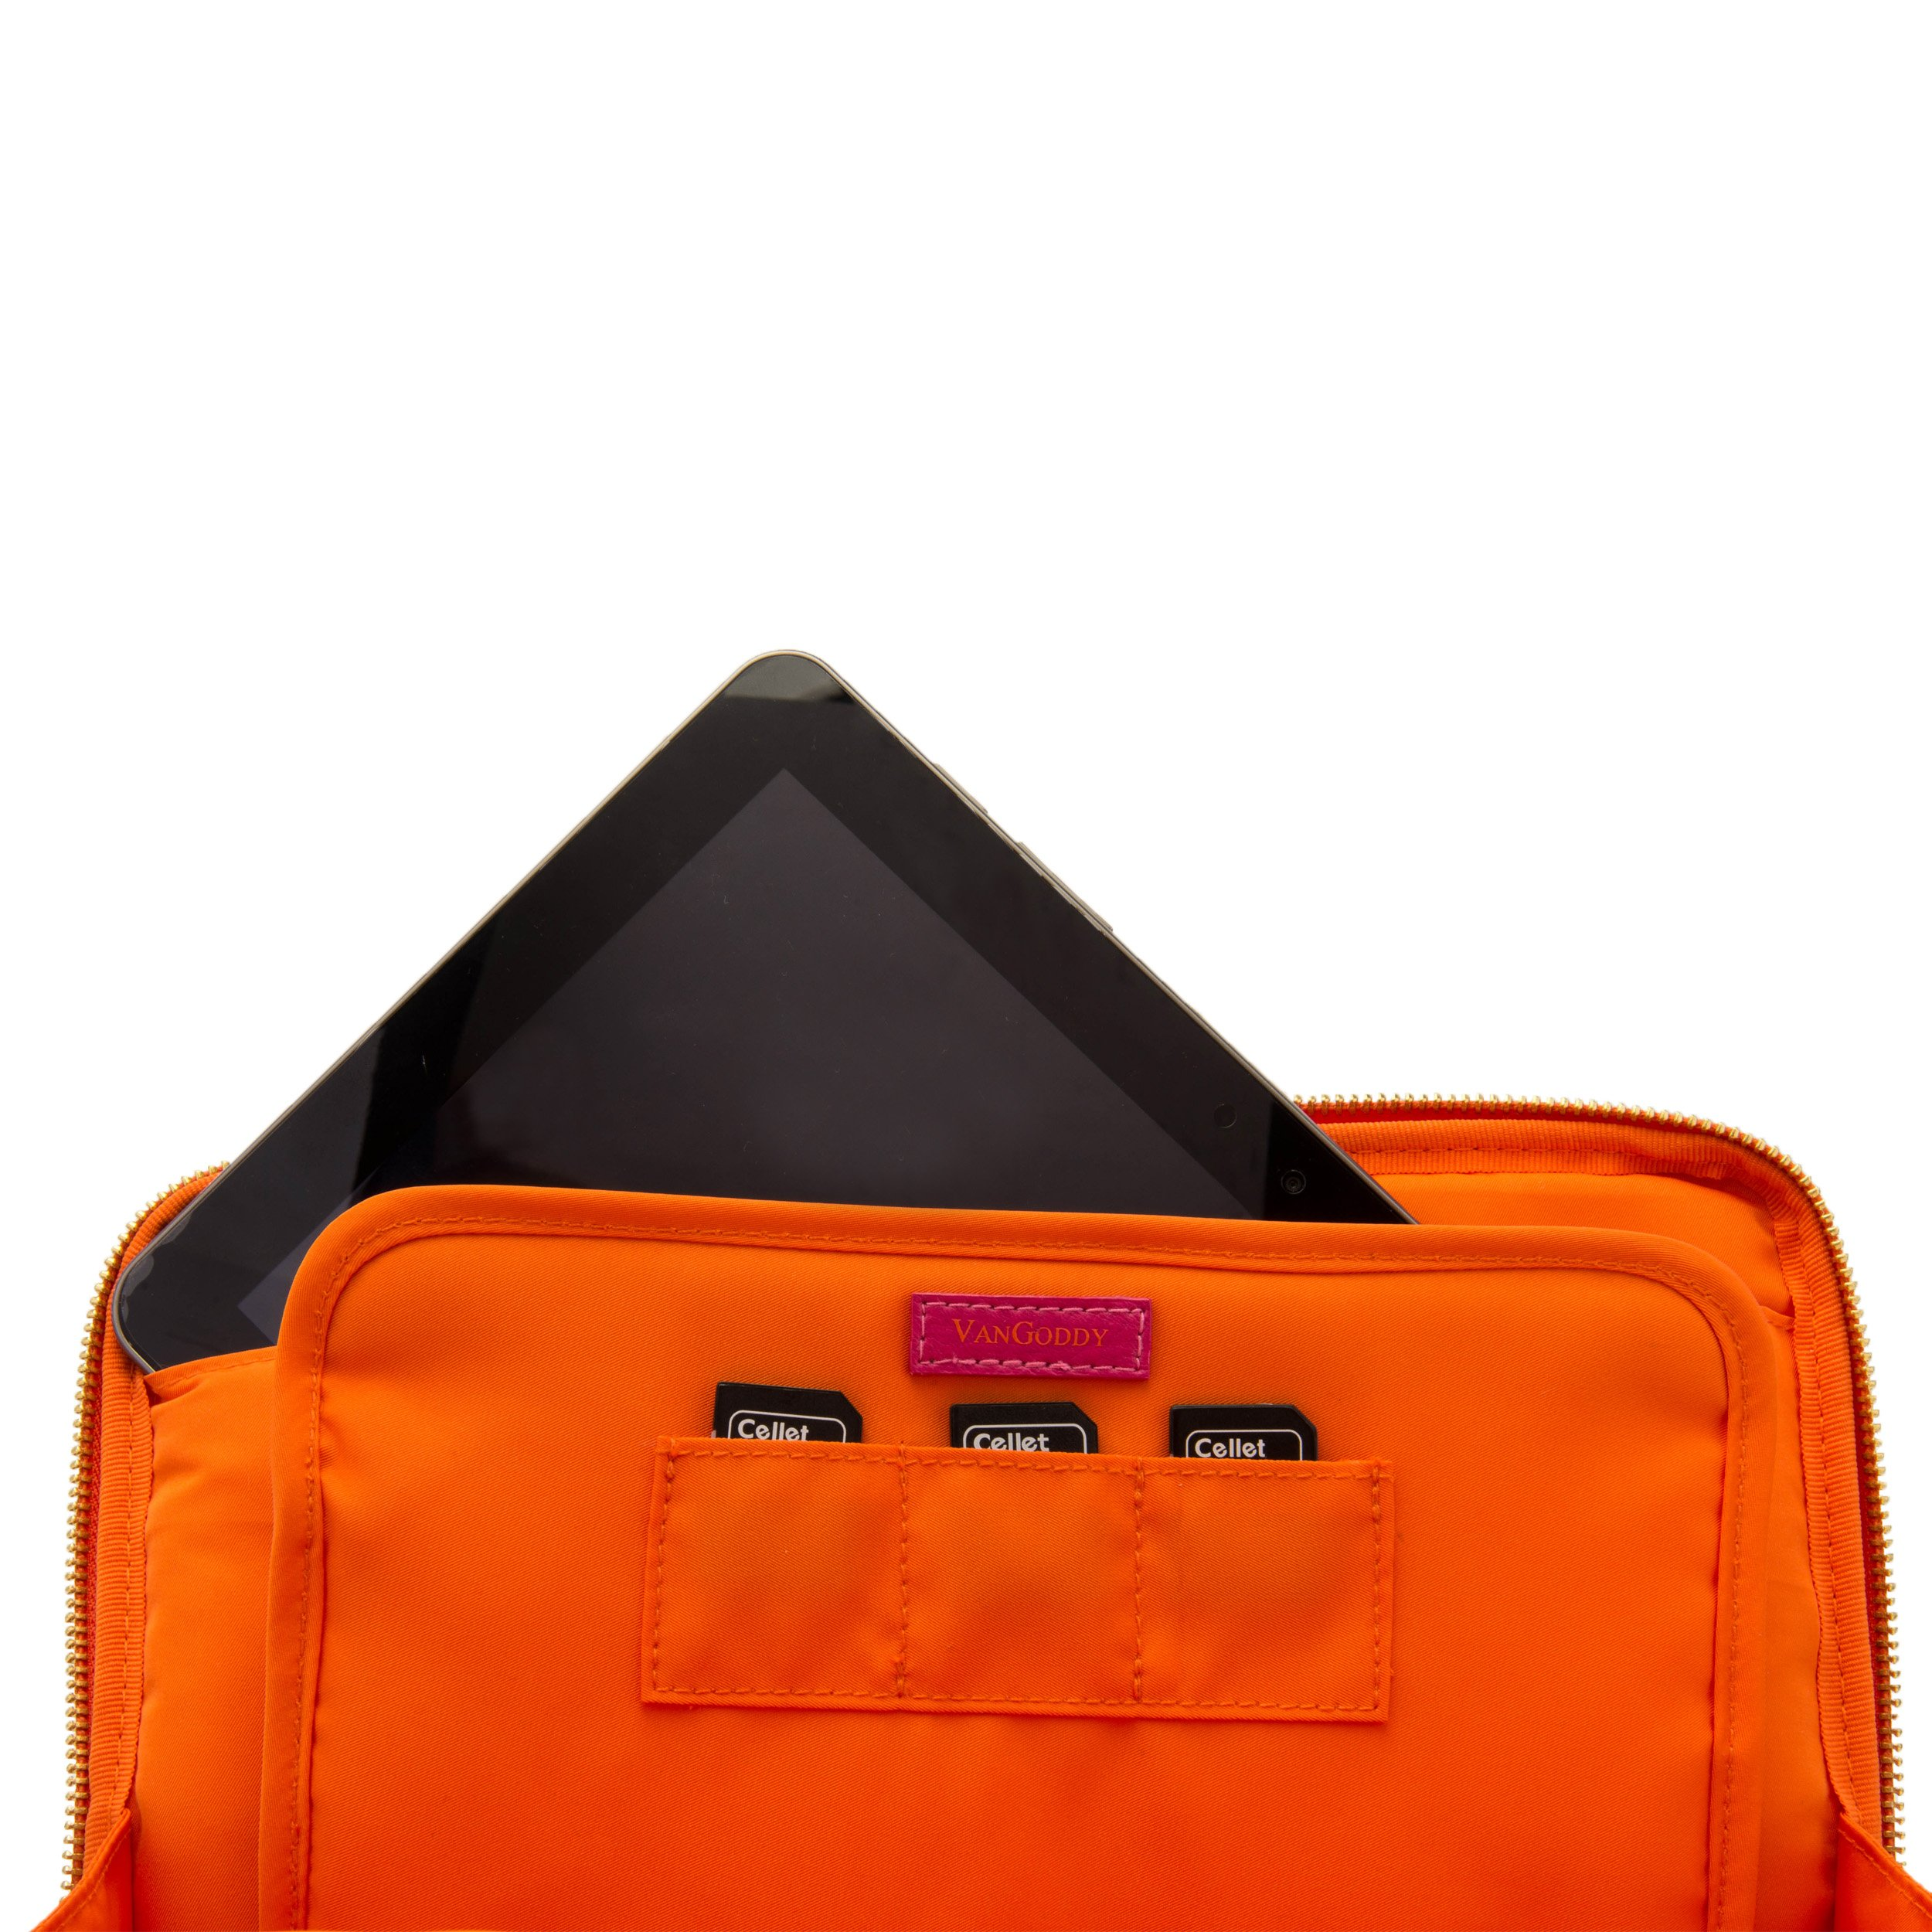 Travel Leatherette Sleeve For Samsung Galaxy Tab S 10.5 / Galaxy Tab 4 10.1 / Galaxy Tab Pro 10.1 + Bluetooth Speaker by VangoddyCase (Image #6)